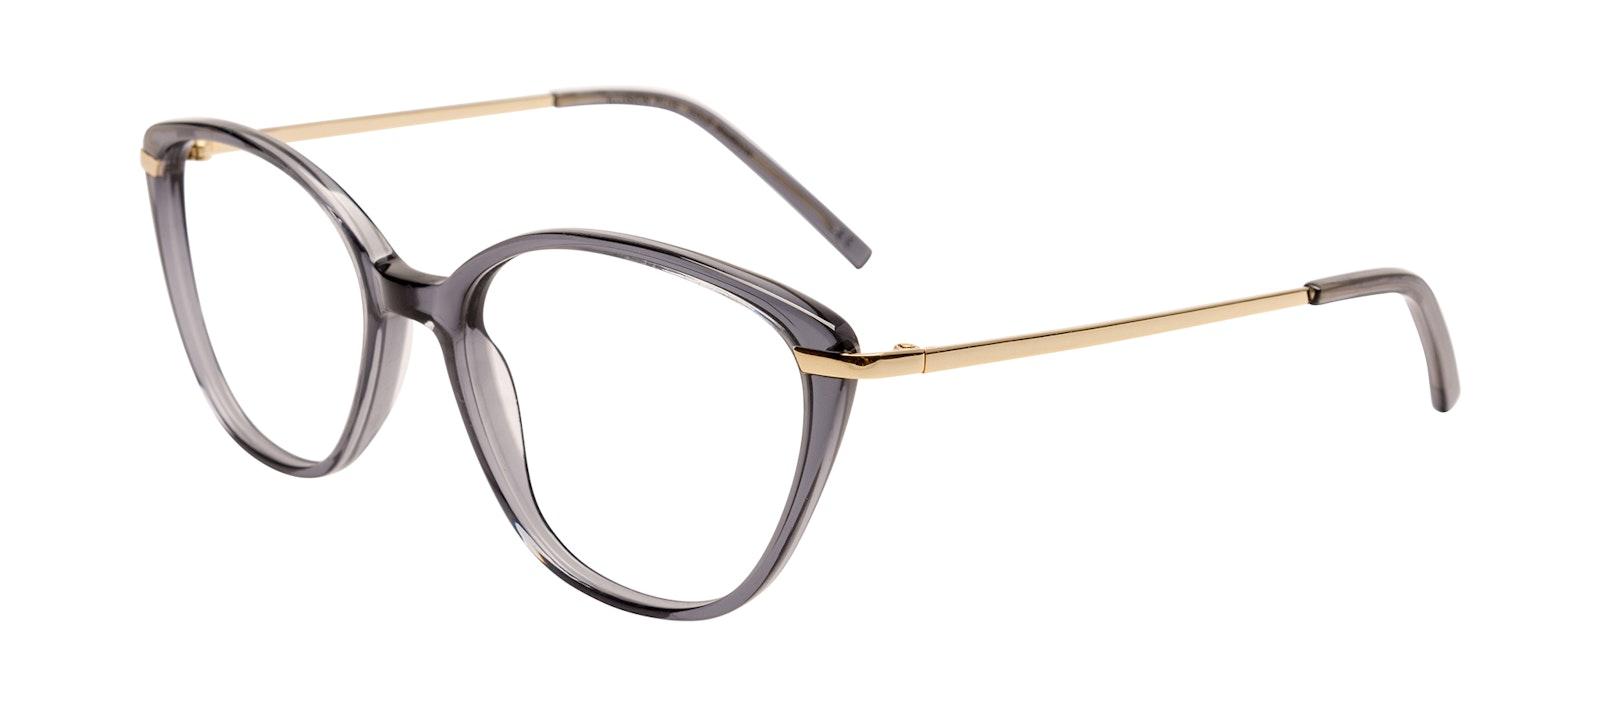 Affordable Fashion Glasses Eyeglasses Women Illusion Plus Gold Shadow Tilt